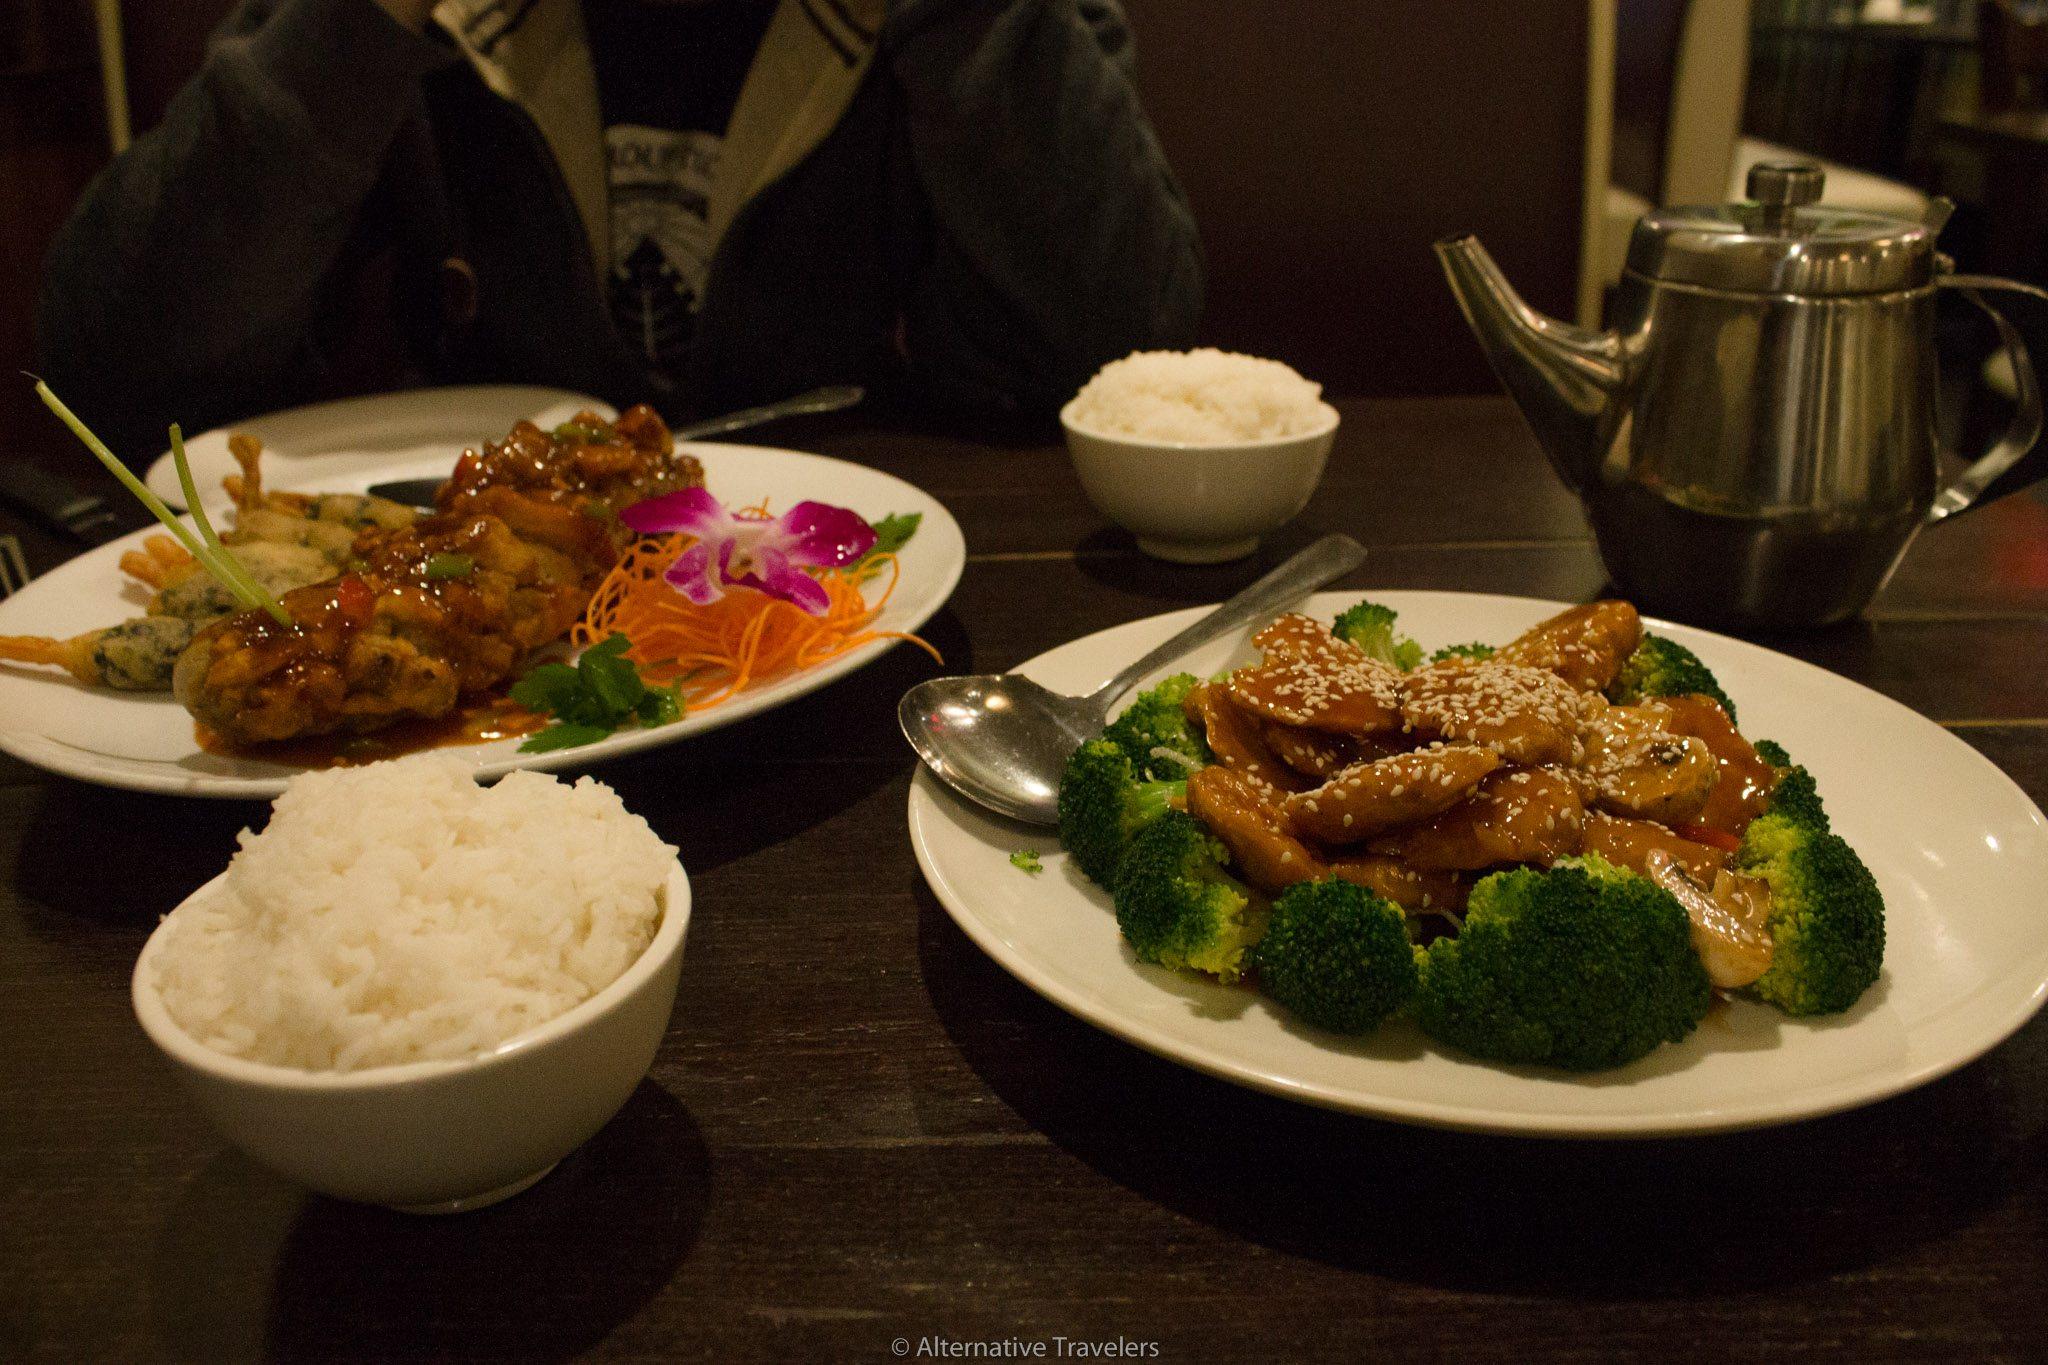 Dragon roll and sesame chicken at Green Zenphony, one of the all vegan restaurants in Queens | AlternativeTravelers.com